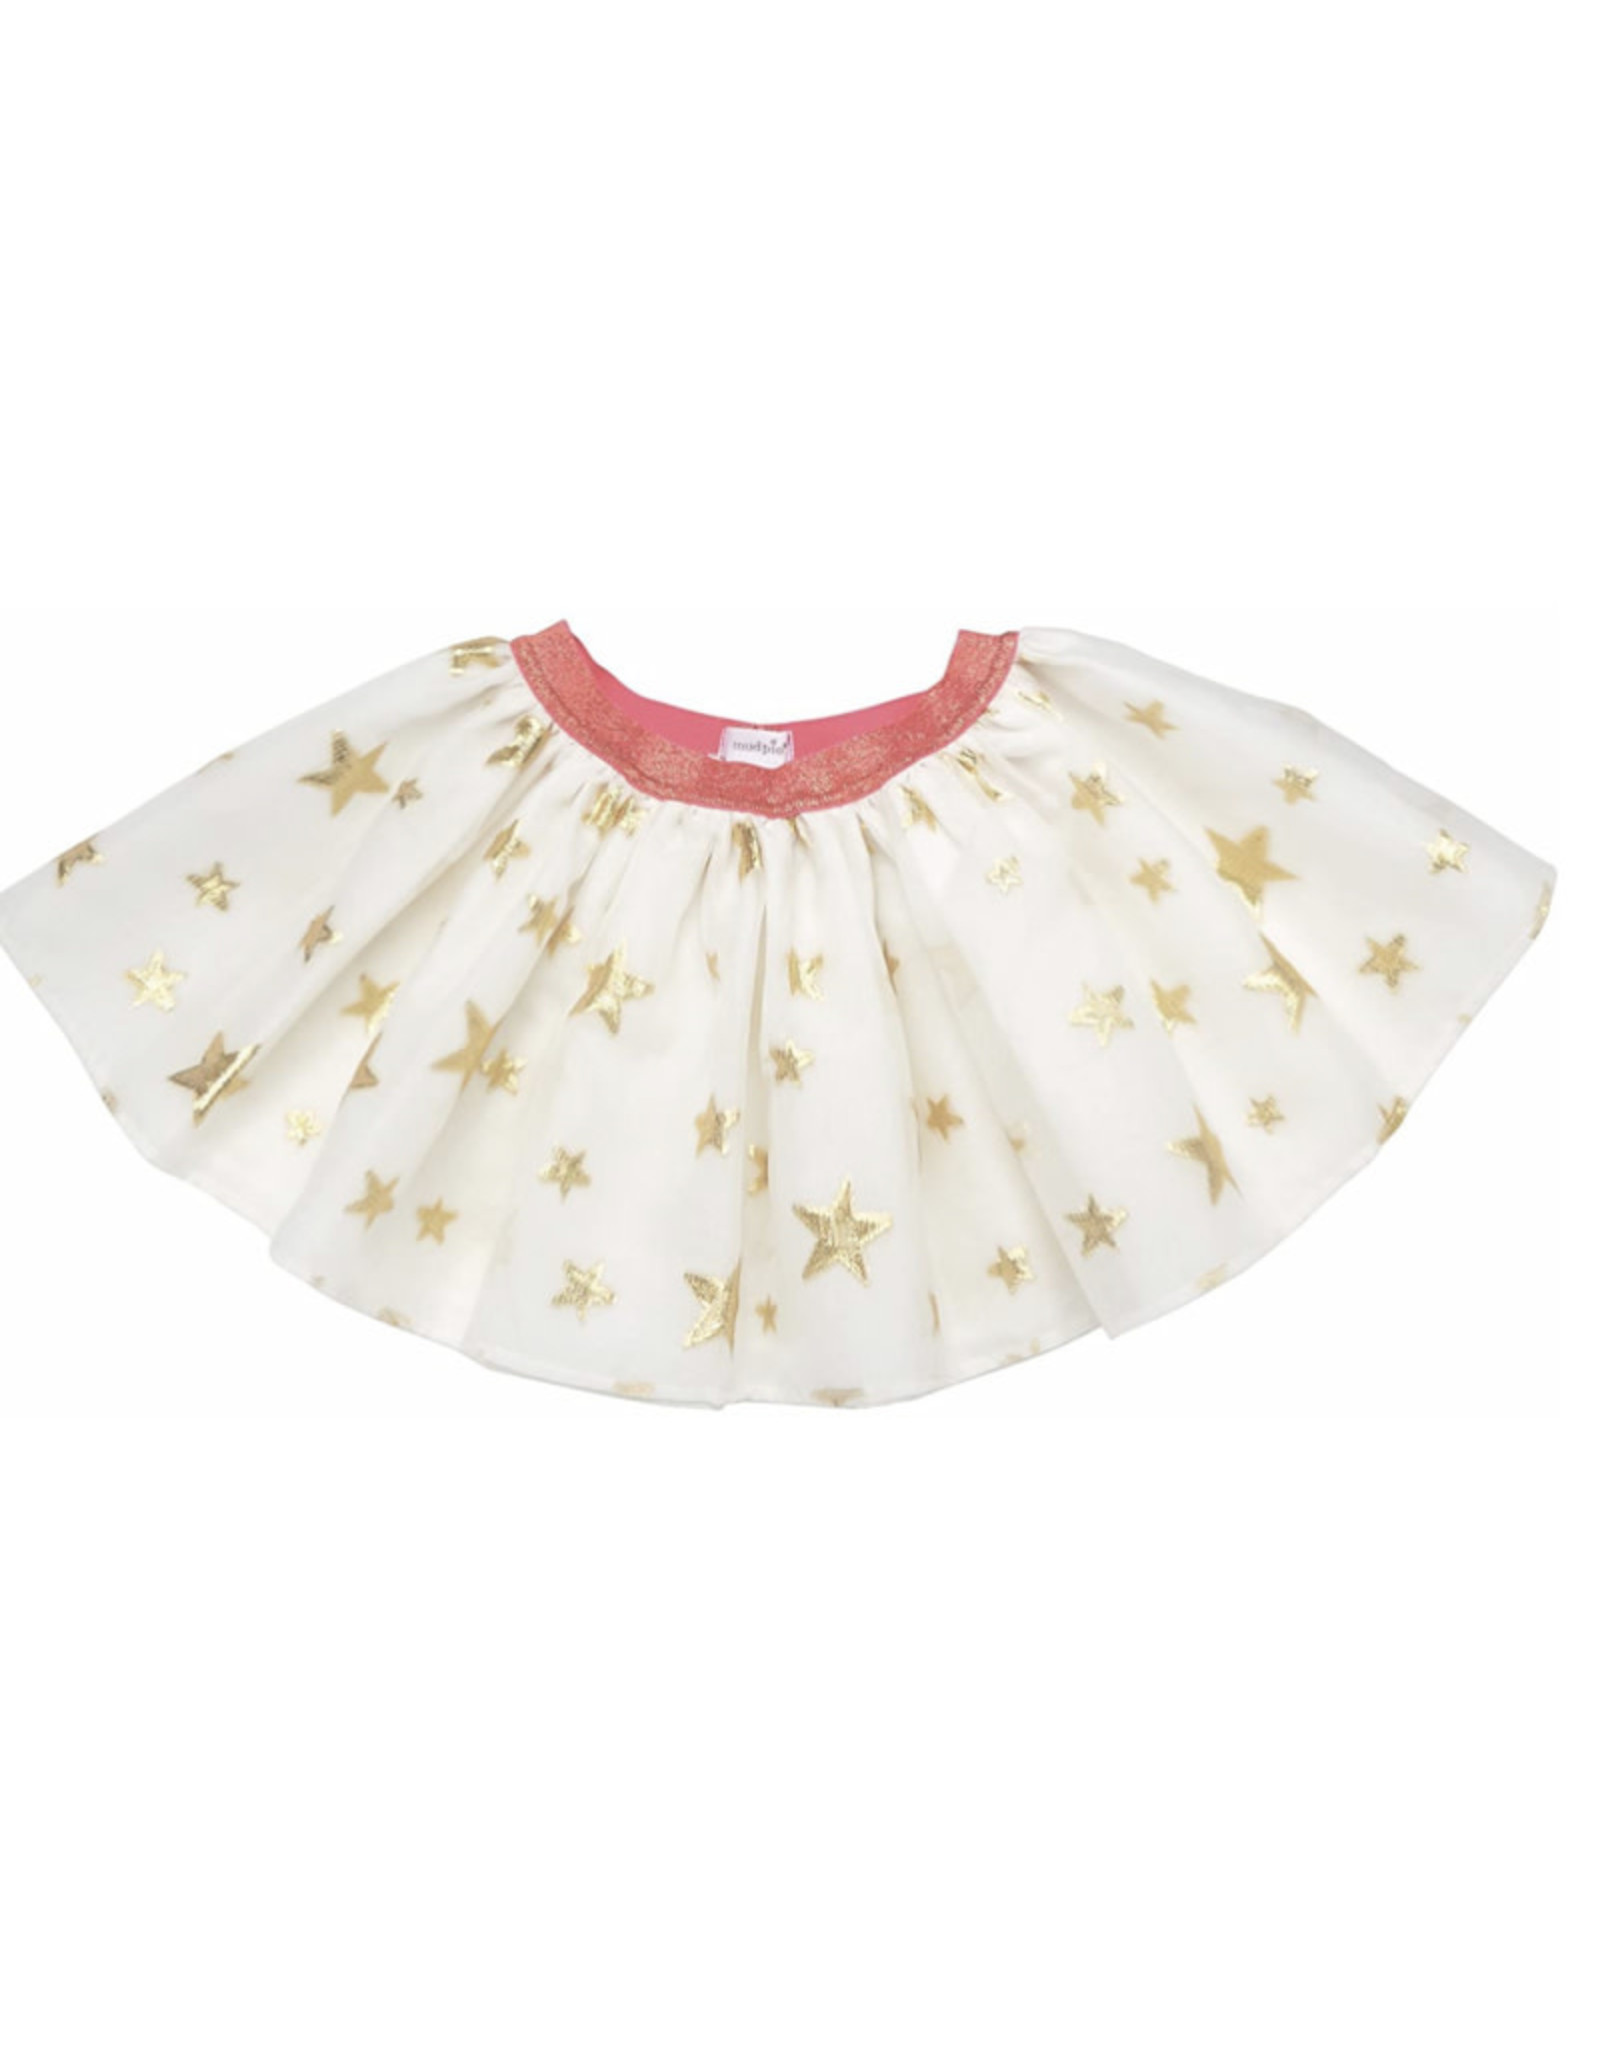 Mudpie Mud Pie - Gold Star Skirt 12-18M